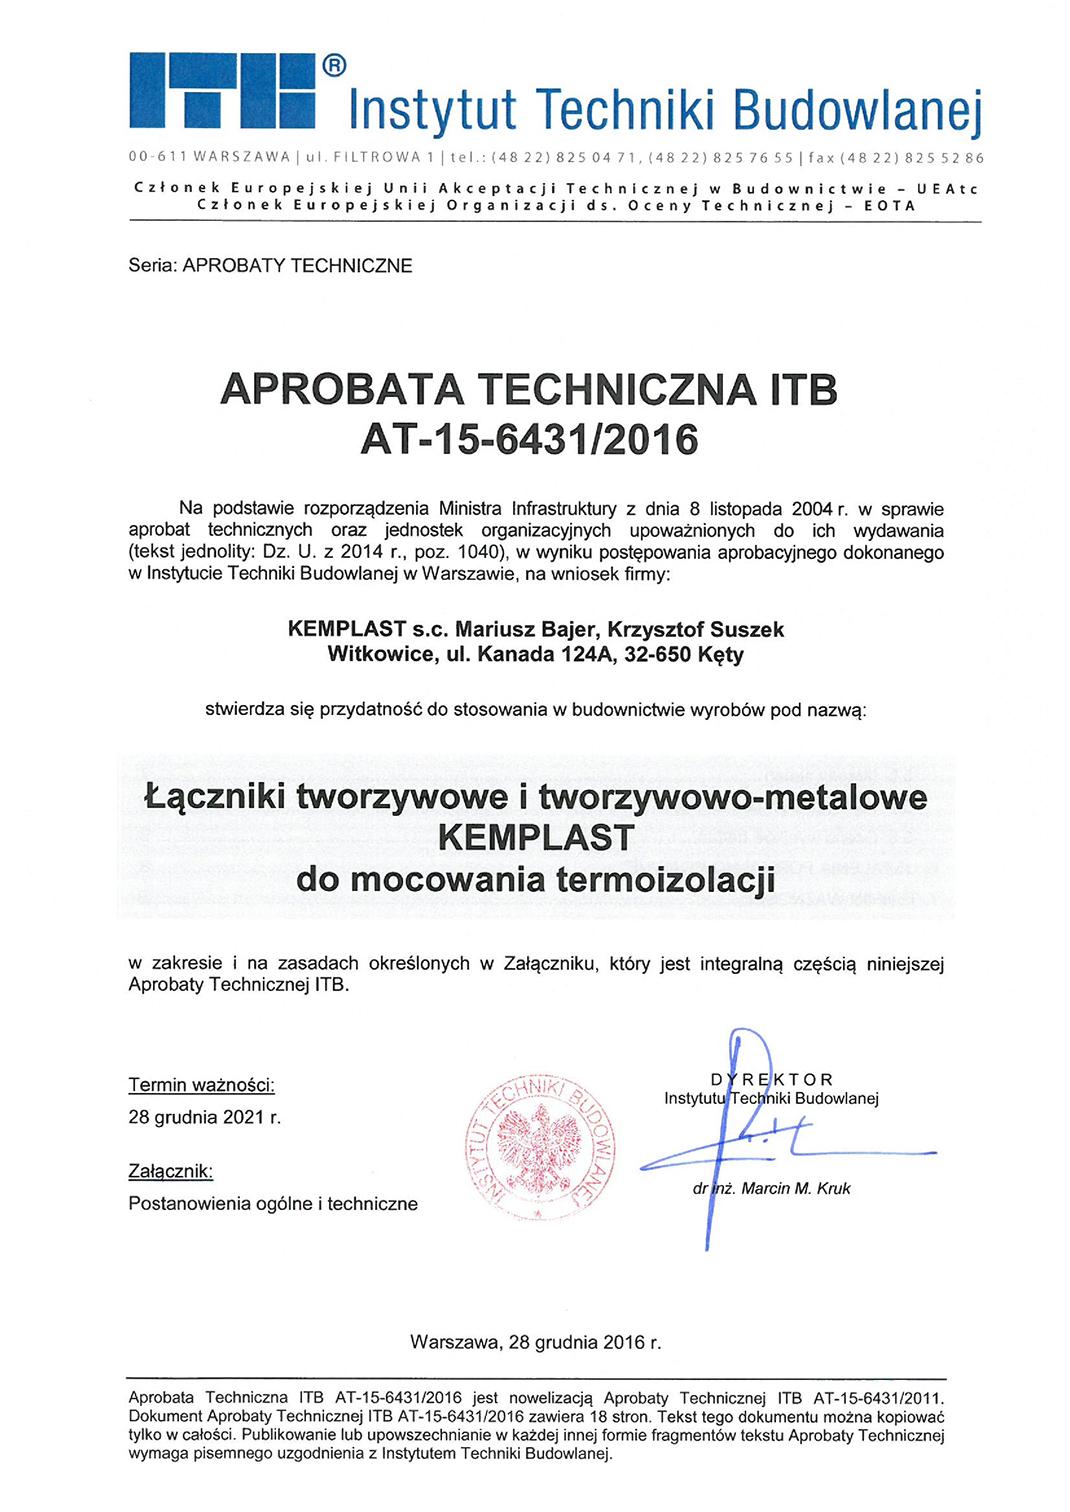 Aprobata techniczna ITB AT-15-6431/2016